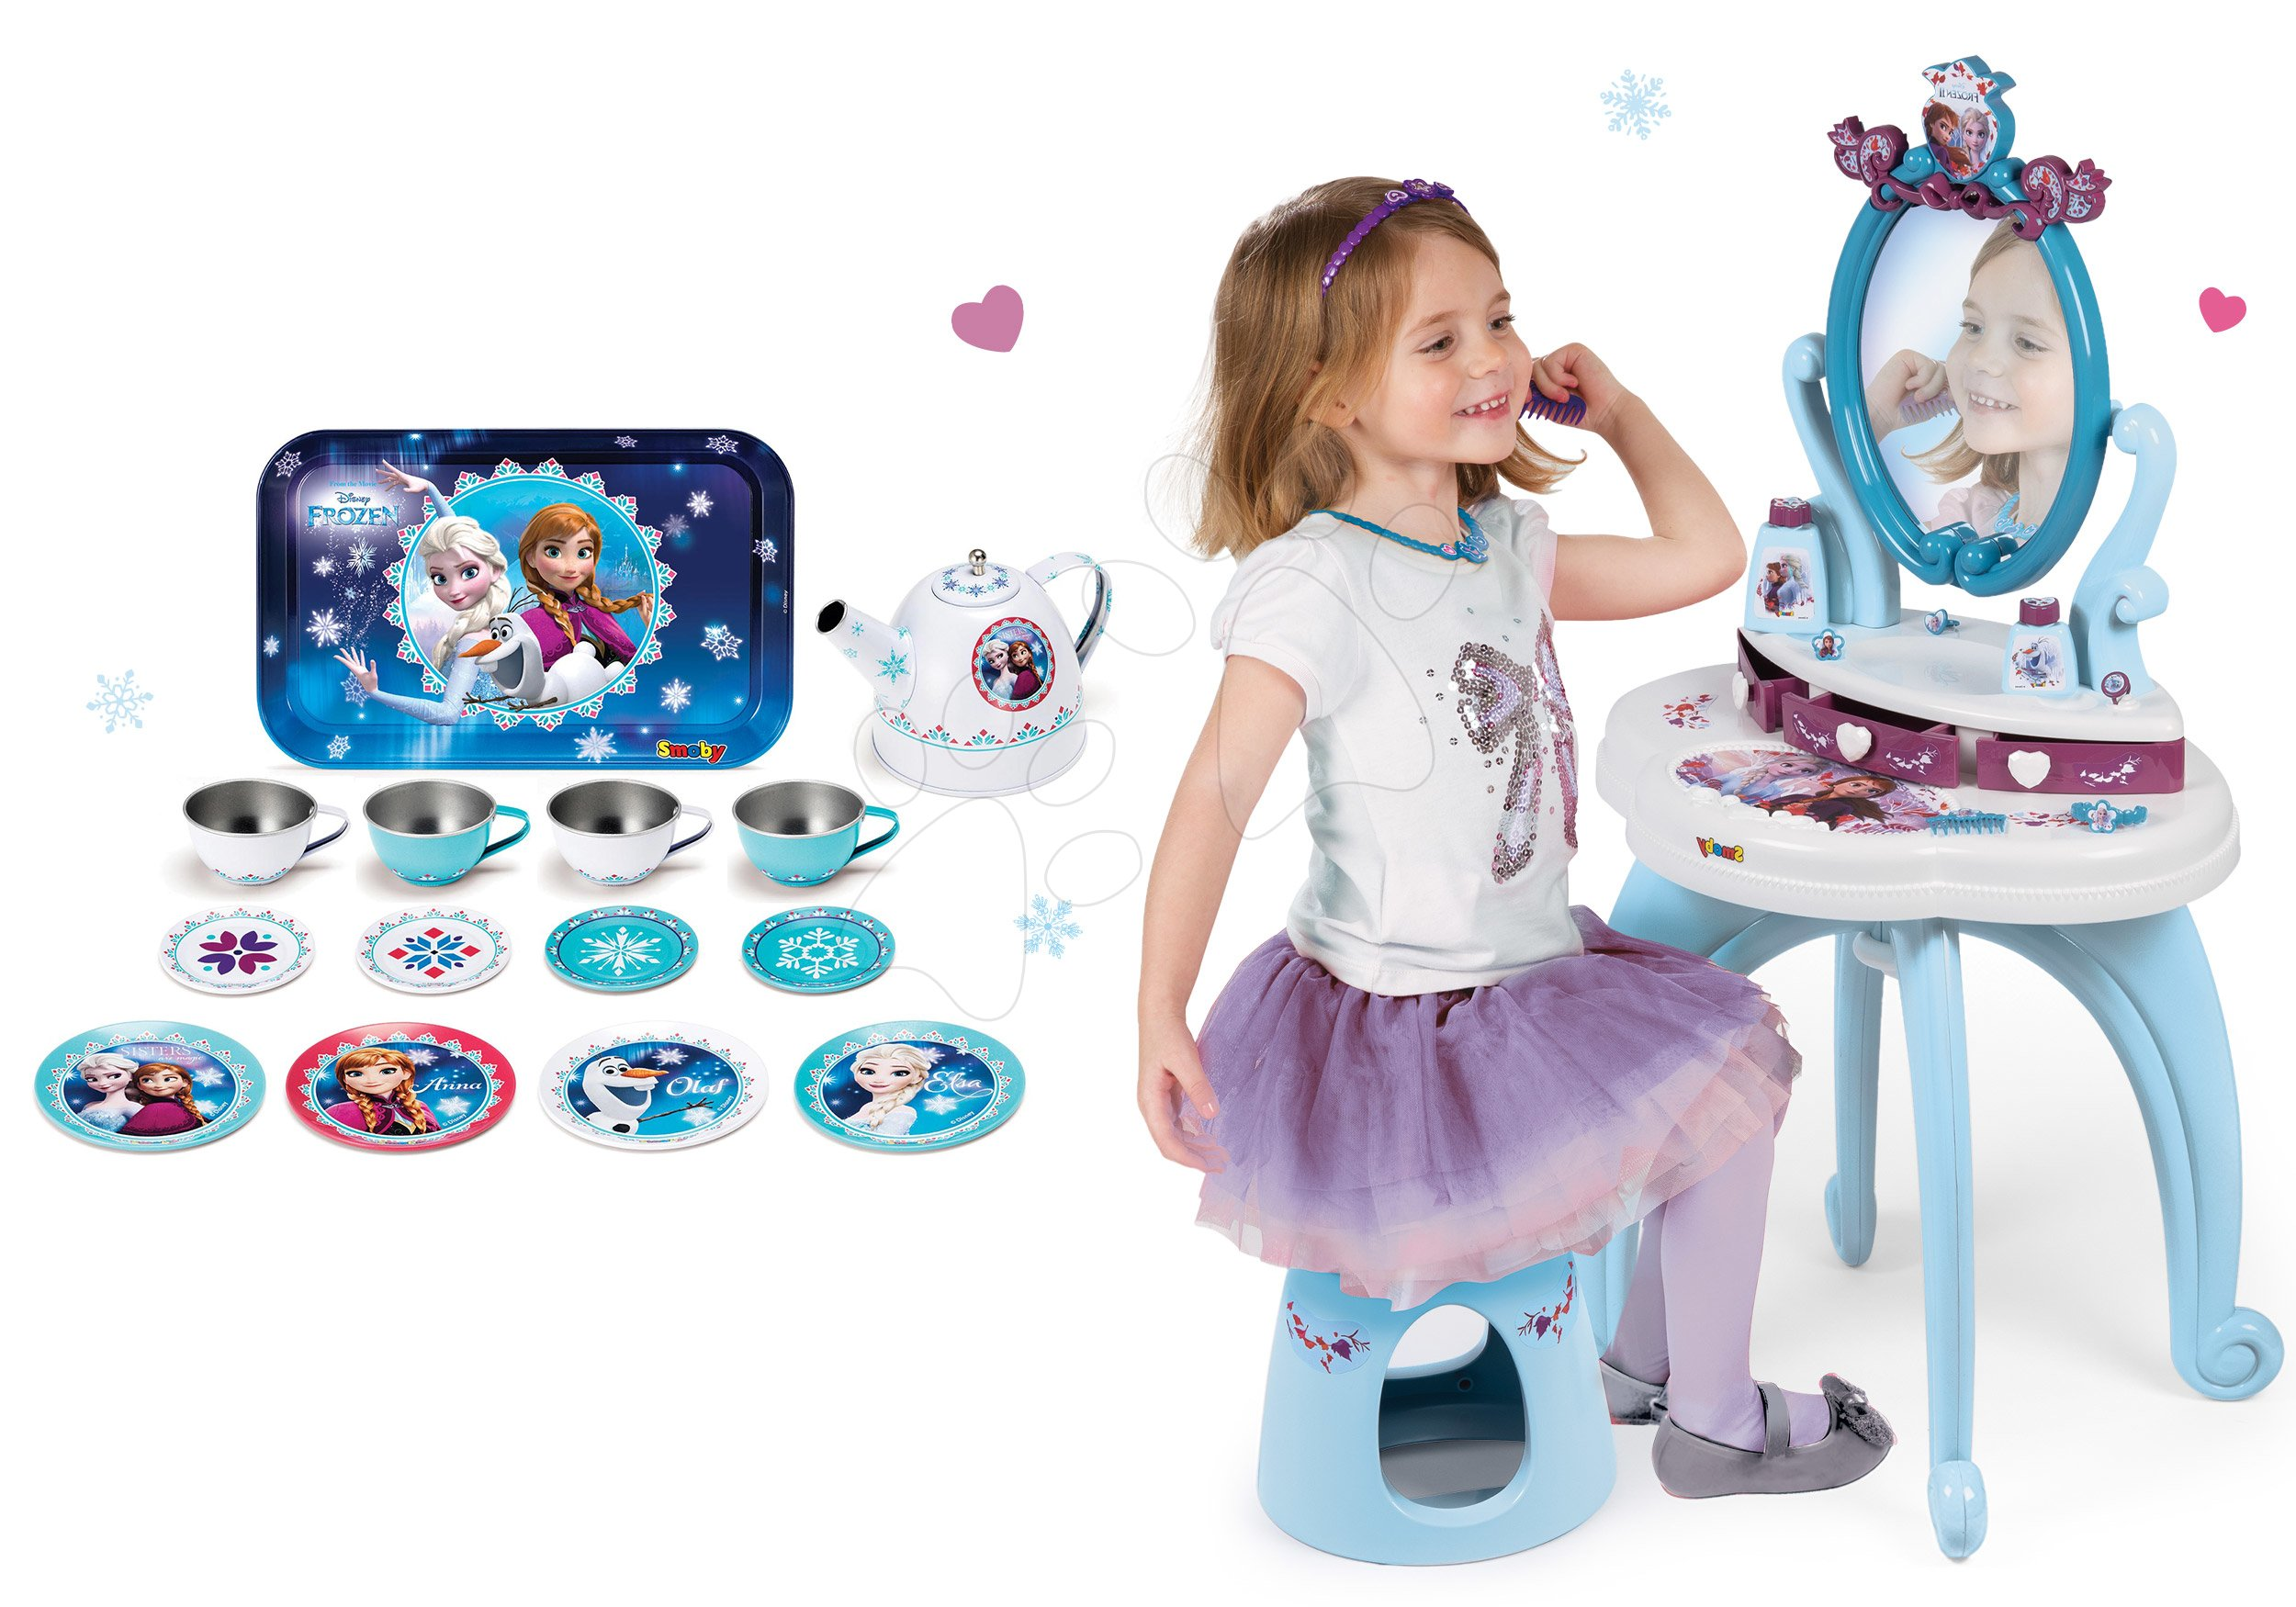 Smoby detský kozmetický stolík a plechová súprava na čaj Frozen 320214-4